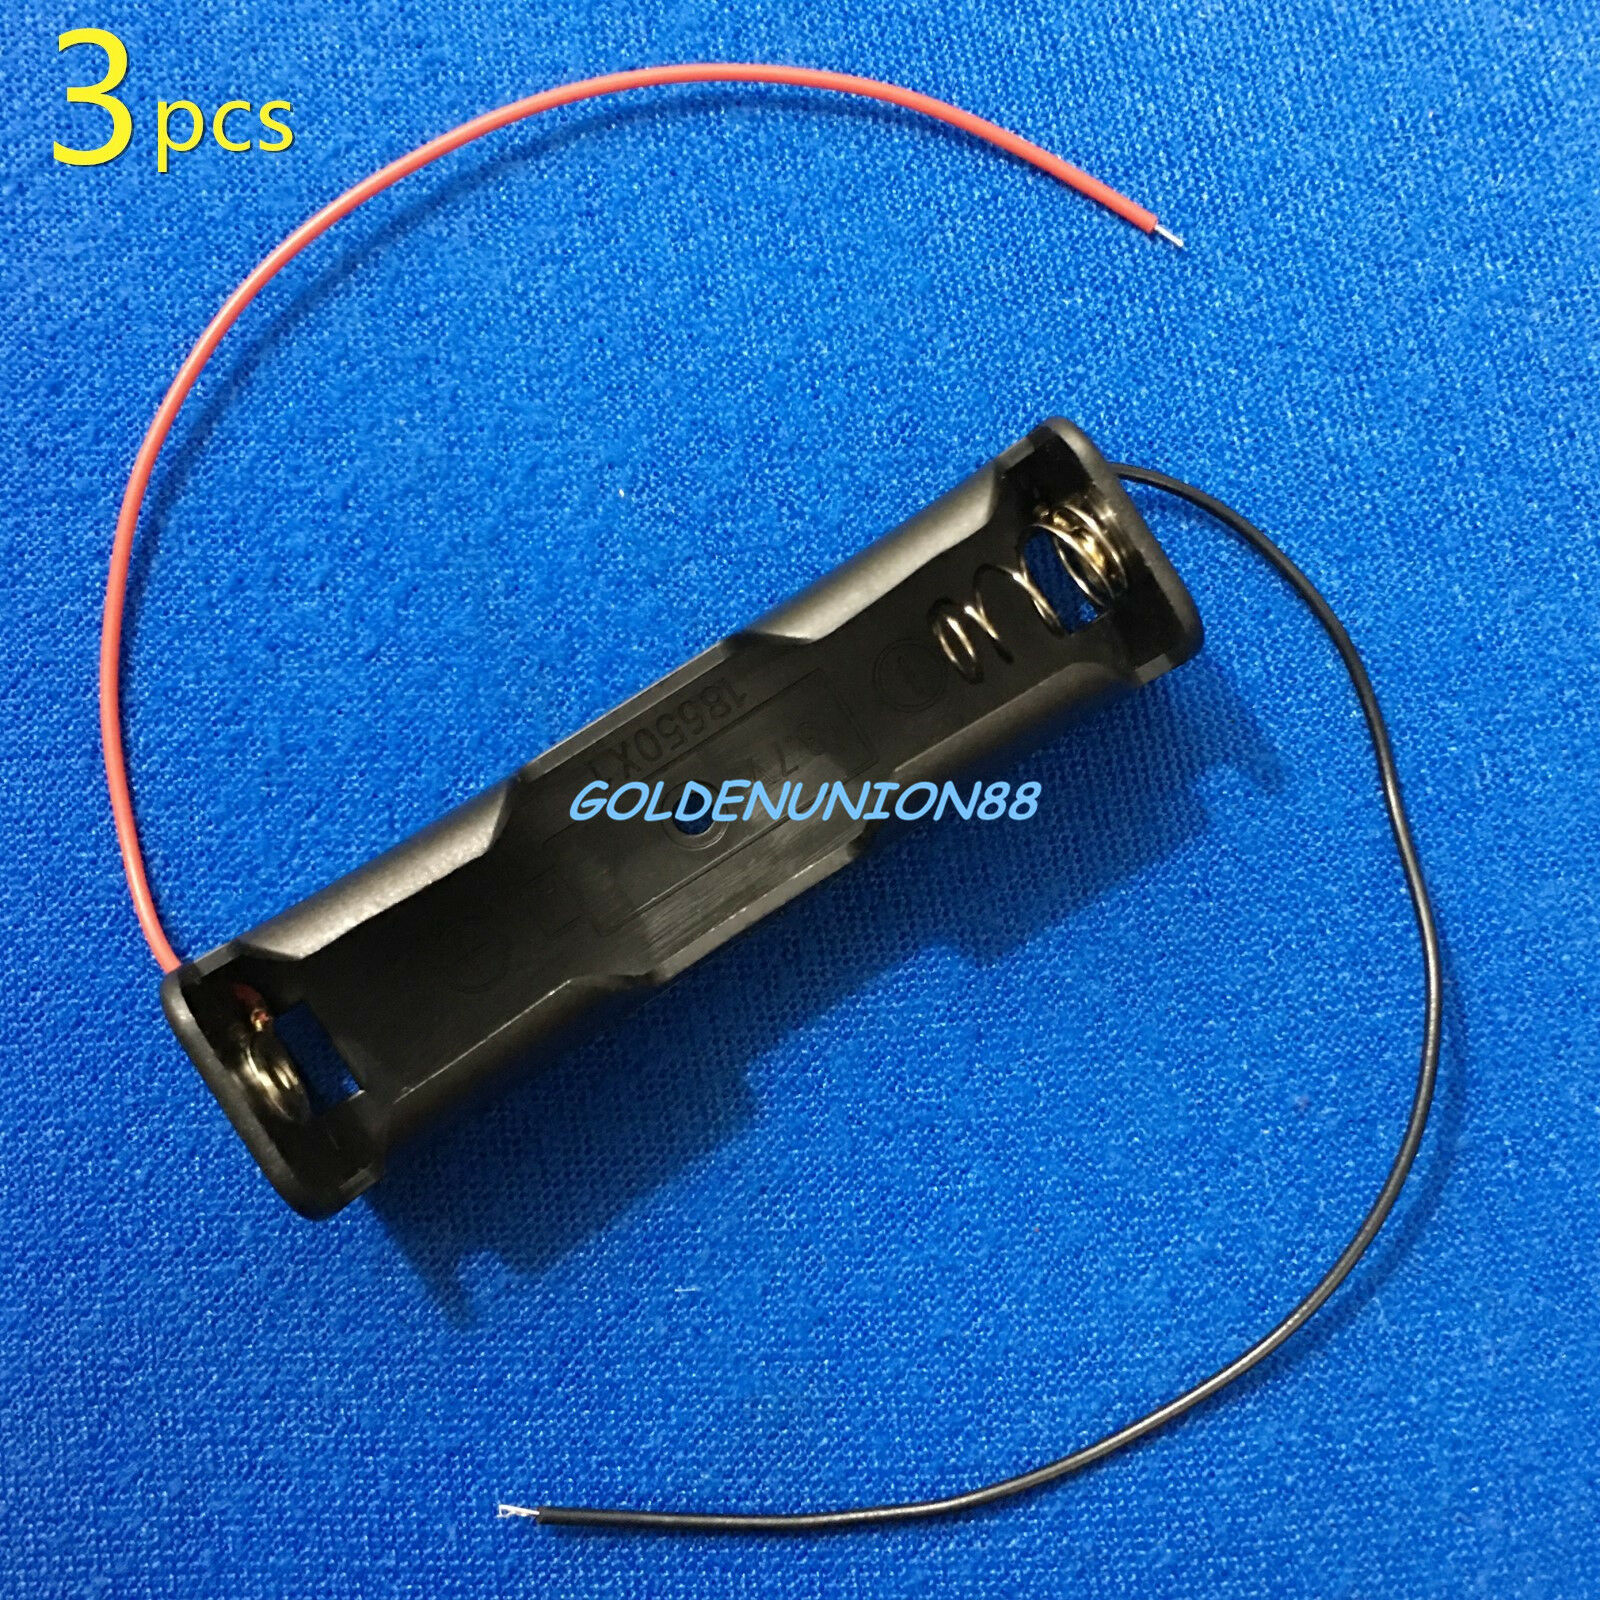 3pc one slot 1S18650 clip plastic connector holder case junction box